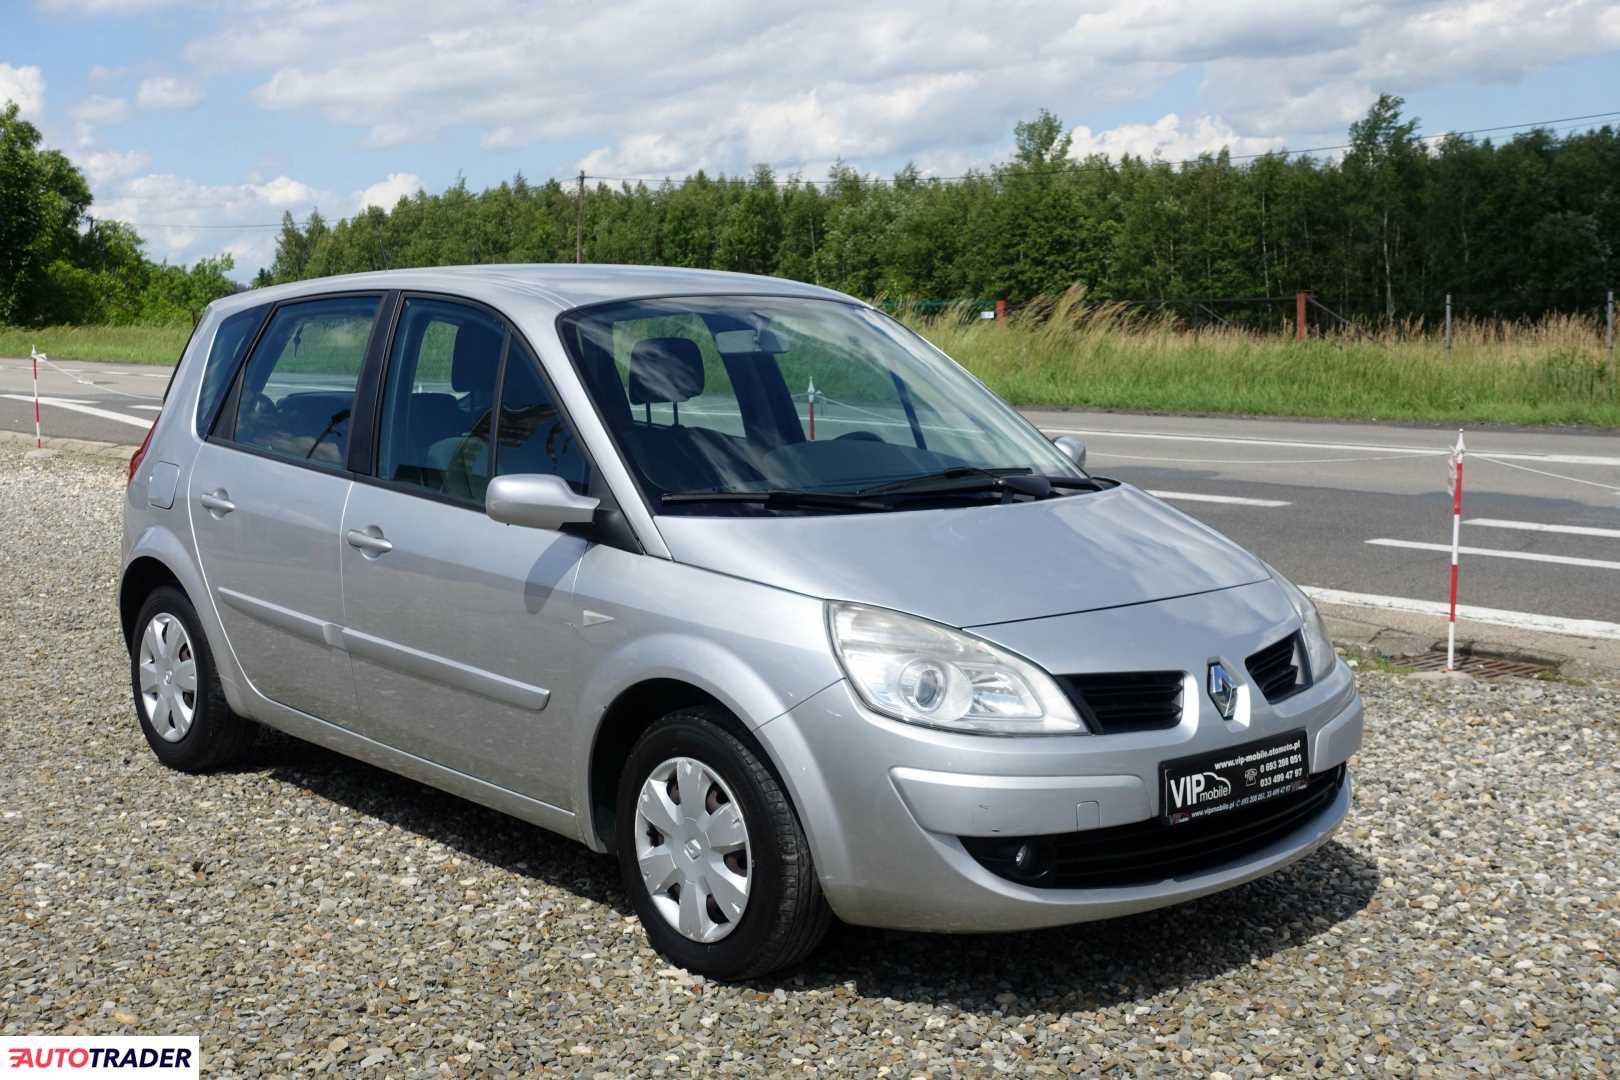 Renault Scenic 2008 1.6 105 KM